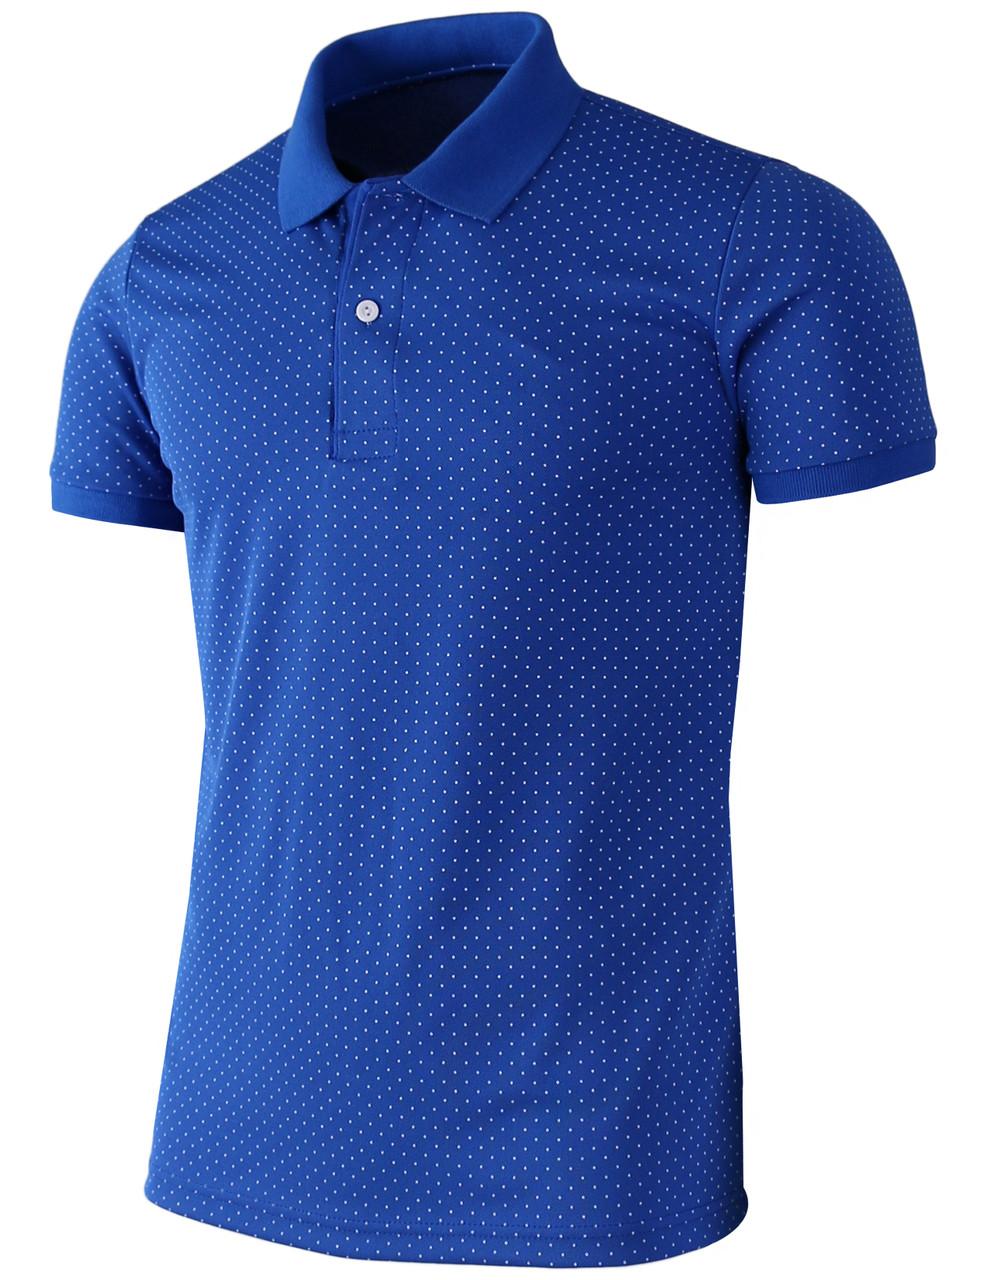 e2ae6d08 Casual short sleeves Dot pattern Design Polo Shirt-4 colors-Unisex